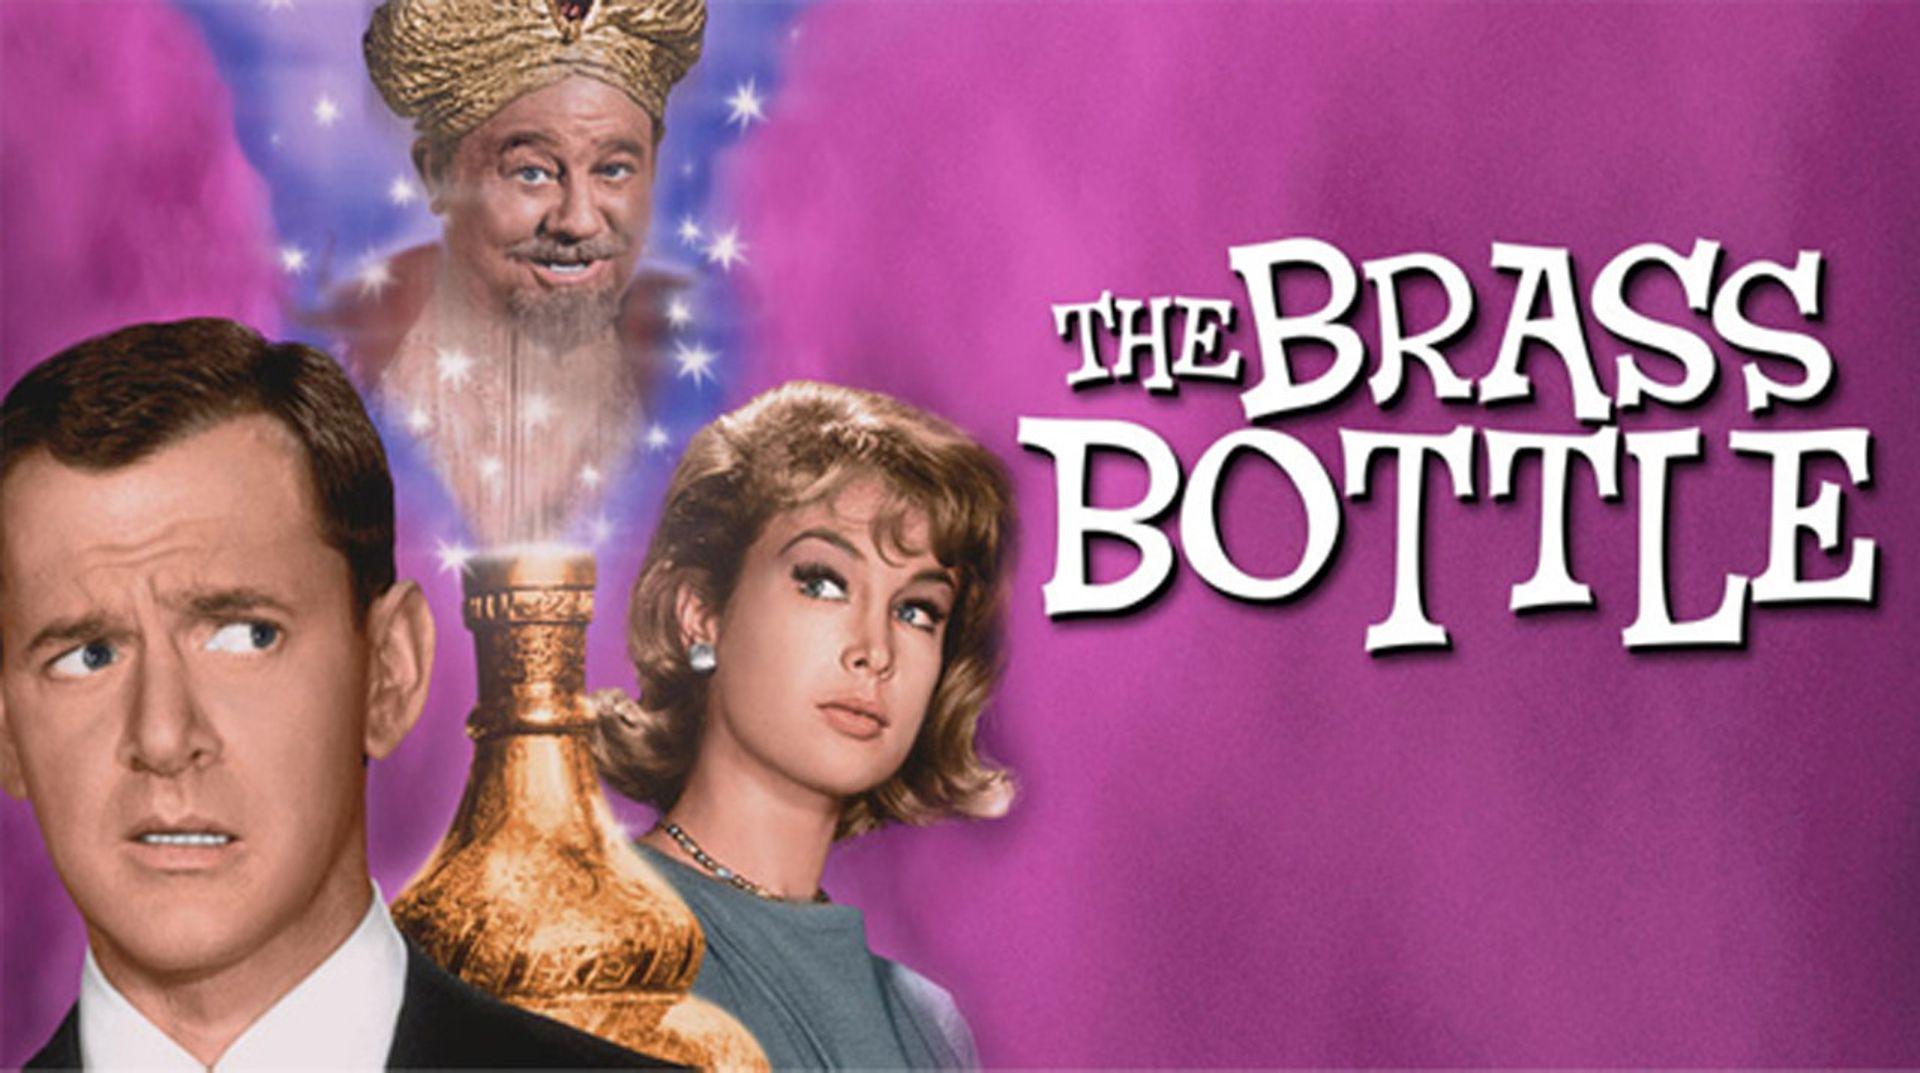 The Brass Bottle (1964) – Comedy, Fantasy